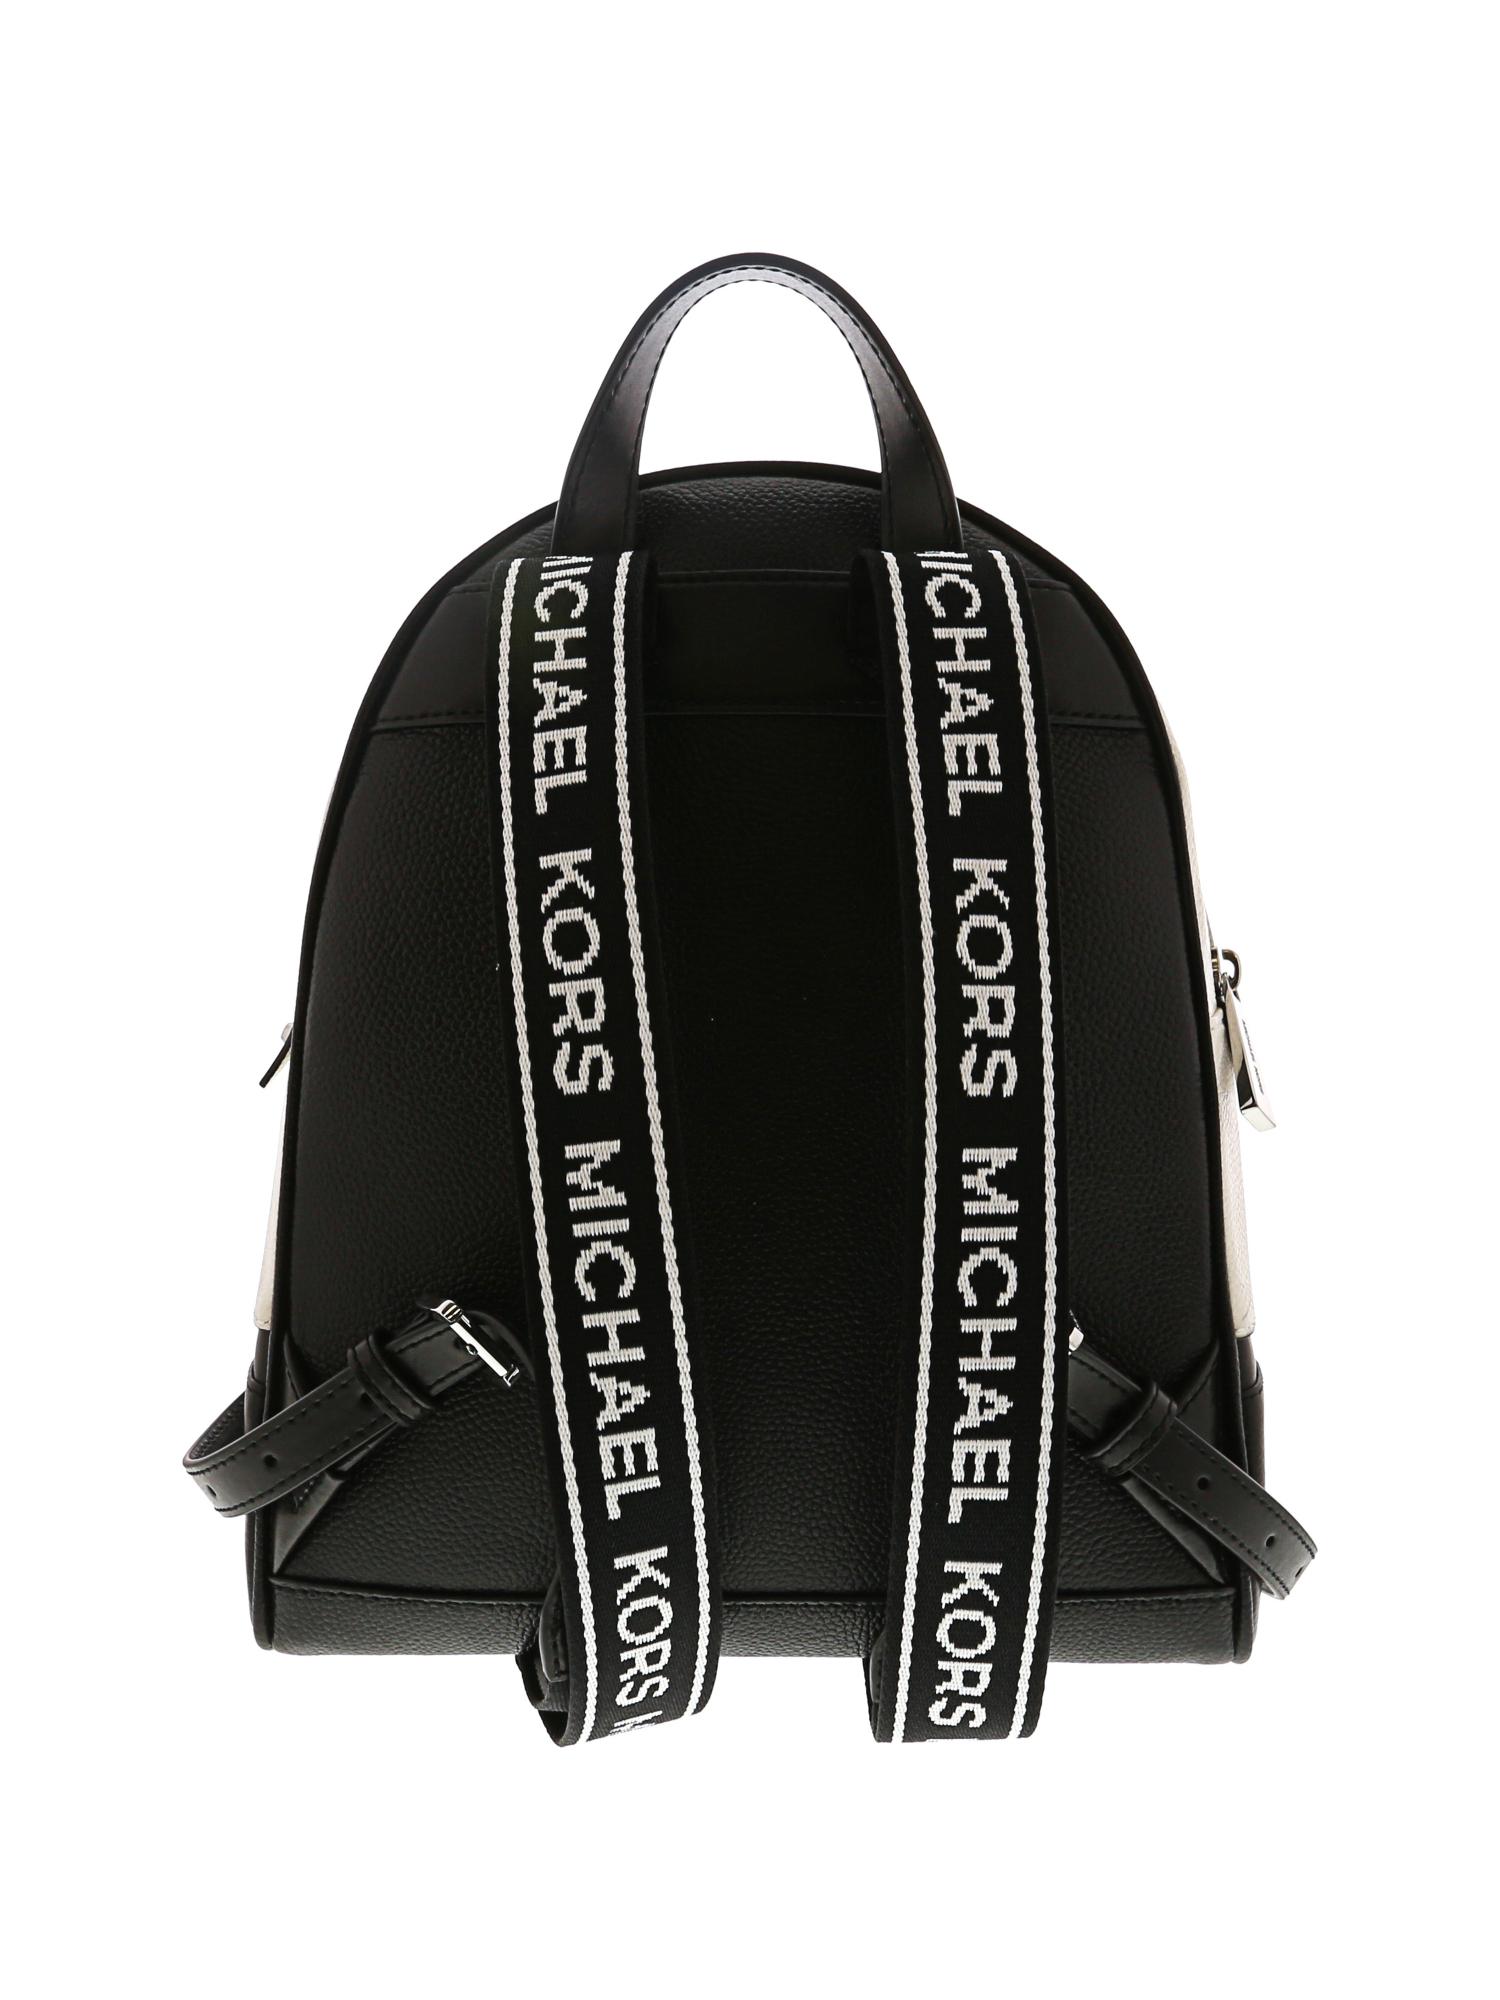 d3c60f0c81 Michael Kors Women's Medium Rhea Logo Tape Leather Backpack | eBay